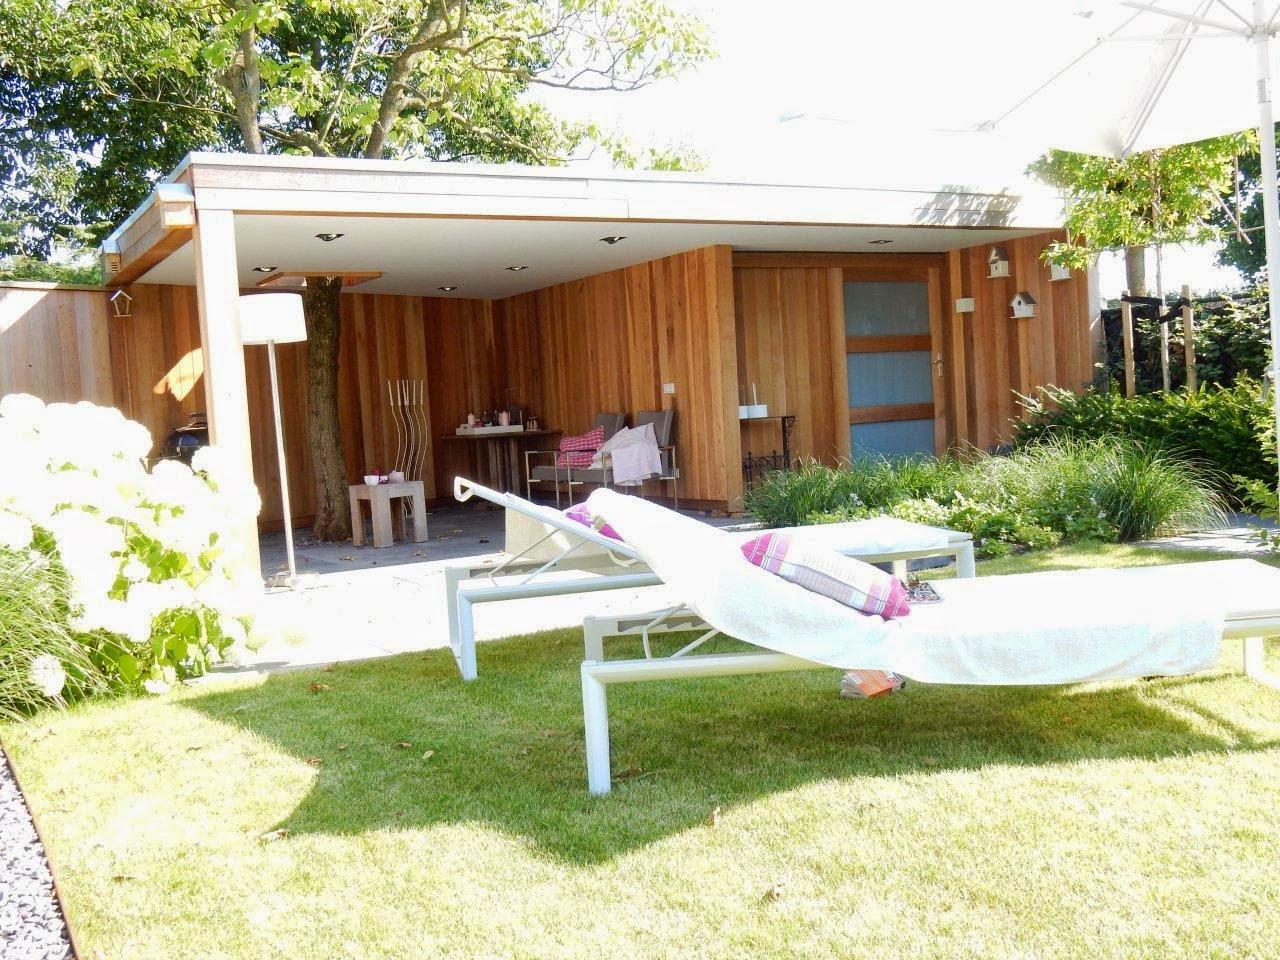 Tuinhuisjes En Prieeltjes Tuinhuis Strak Modern Met Afgetimmerd